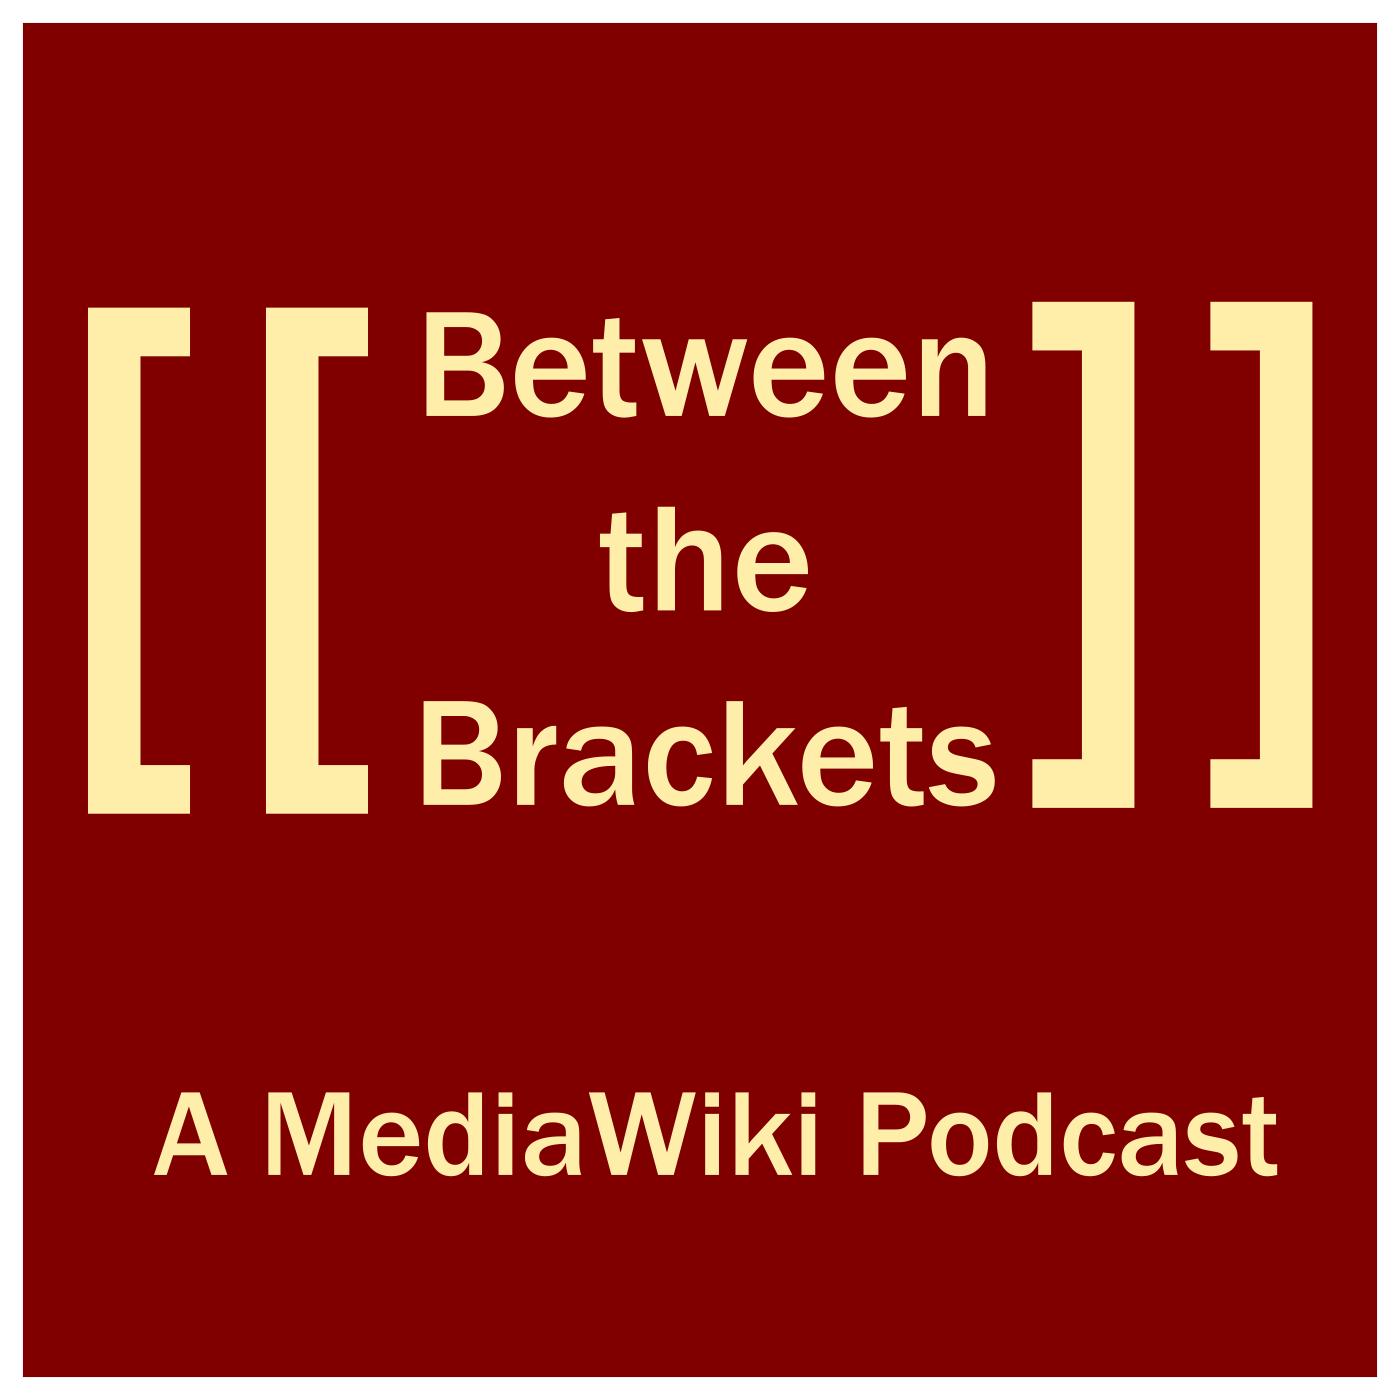 Between the Brackets: a MediaWiki Podcast show art